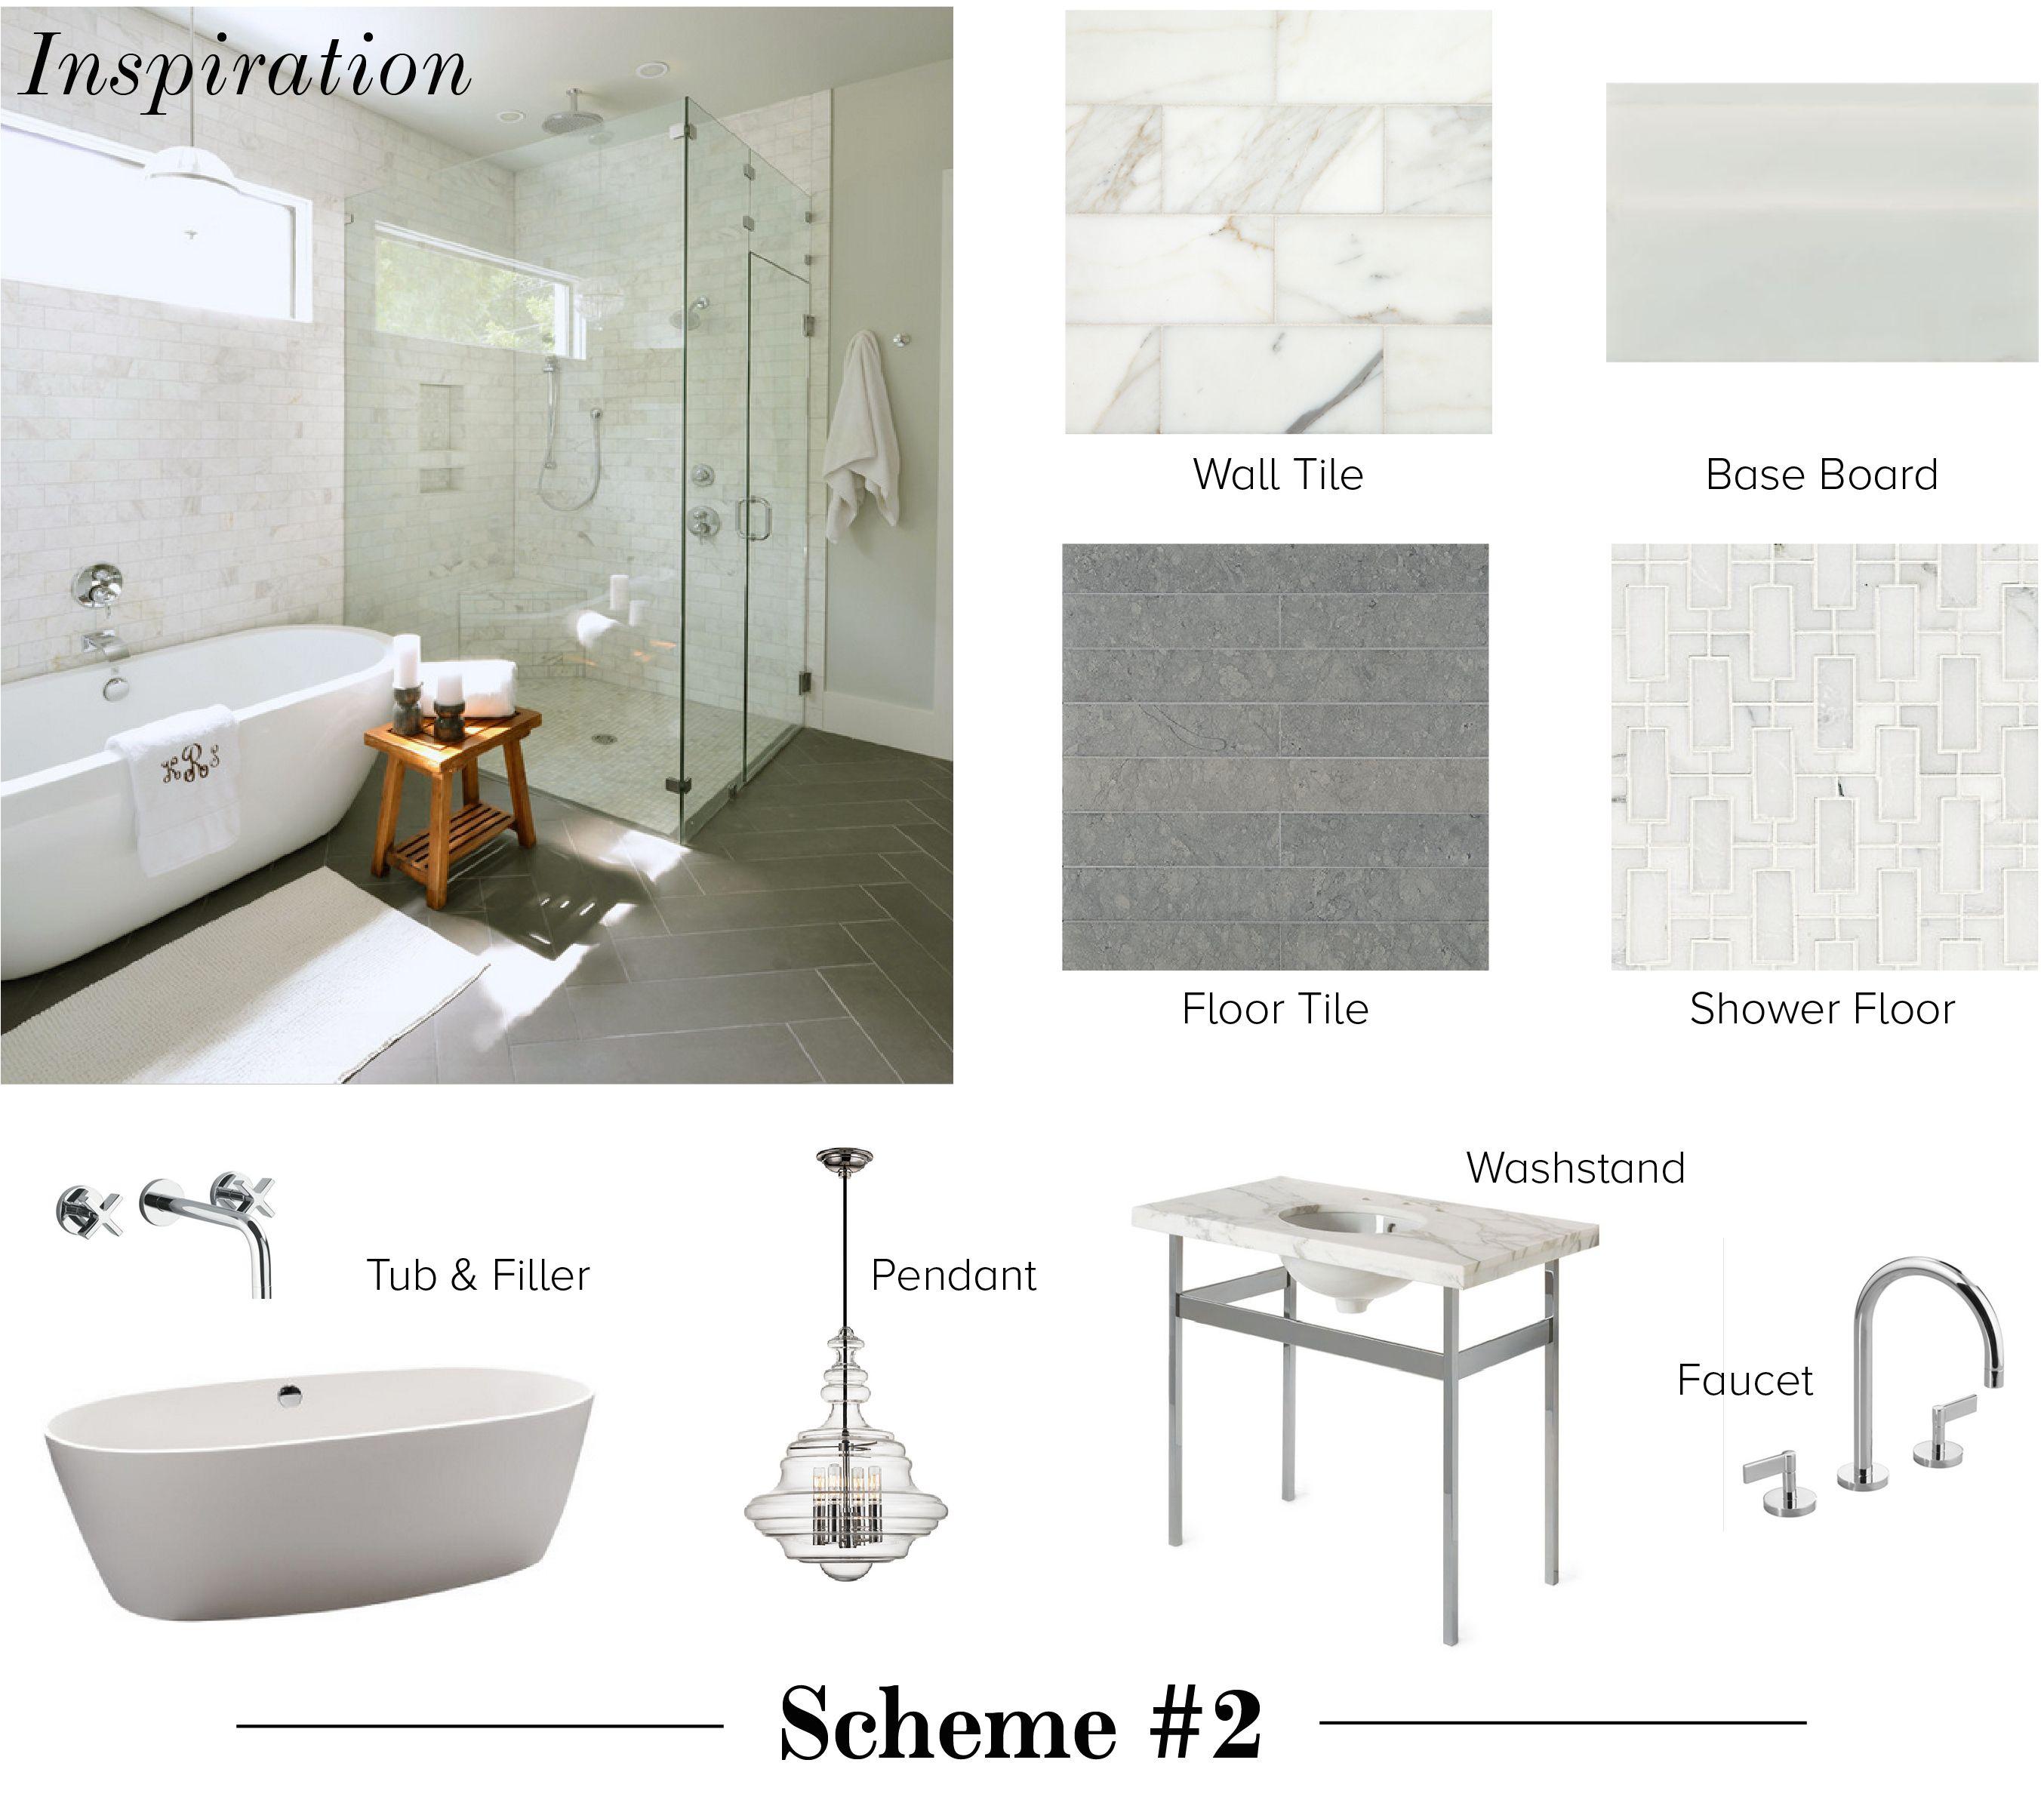 Bathroom Design using Natural Stone & Tile   McGrath II Blog ...